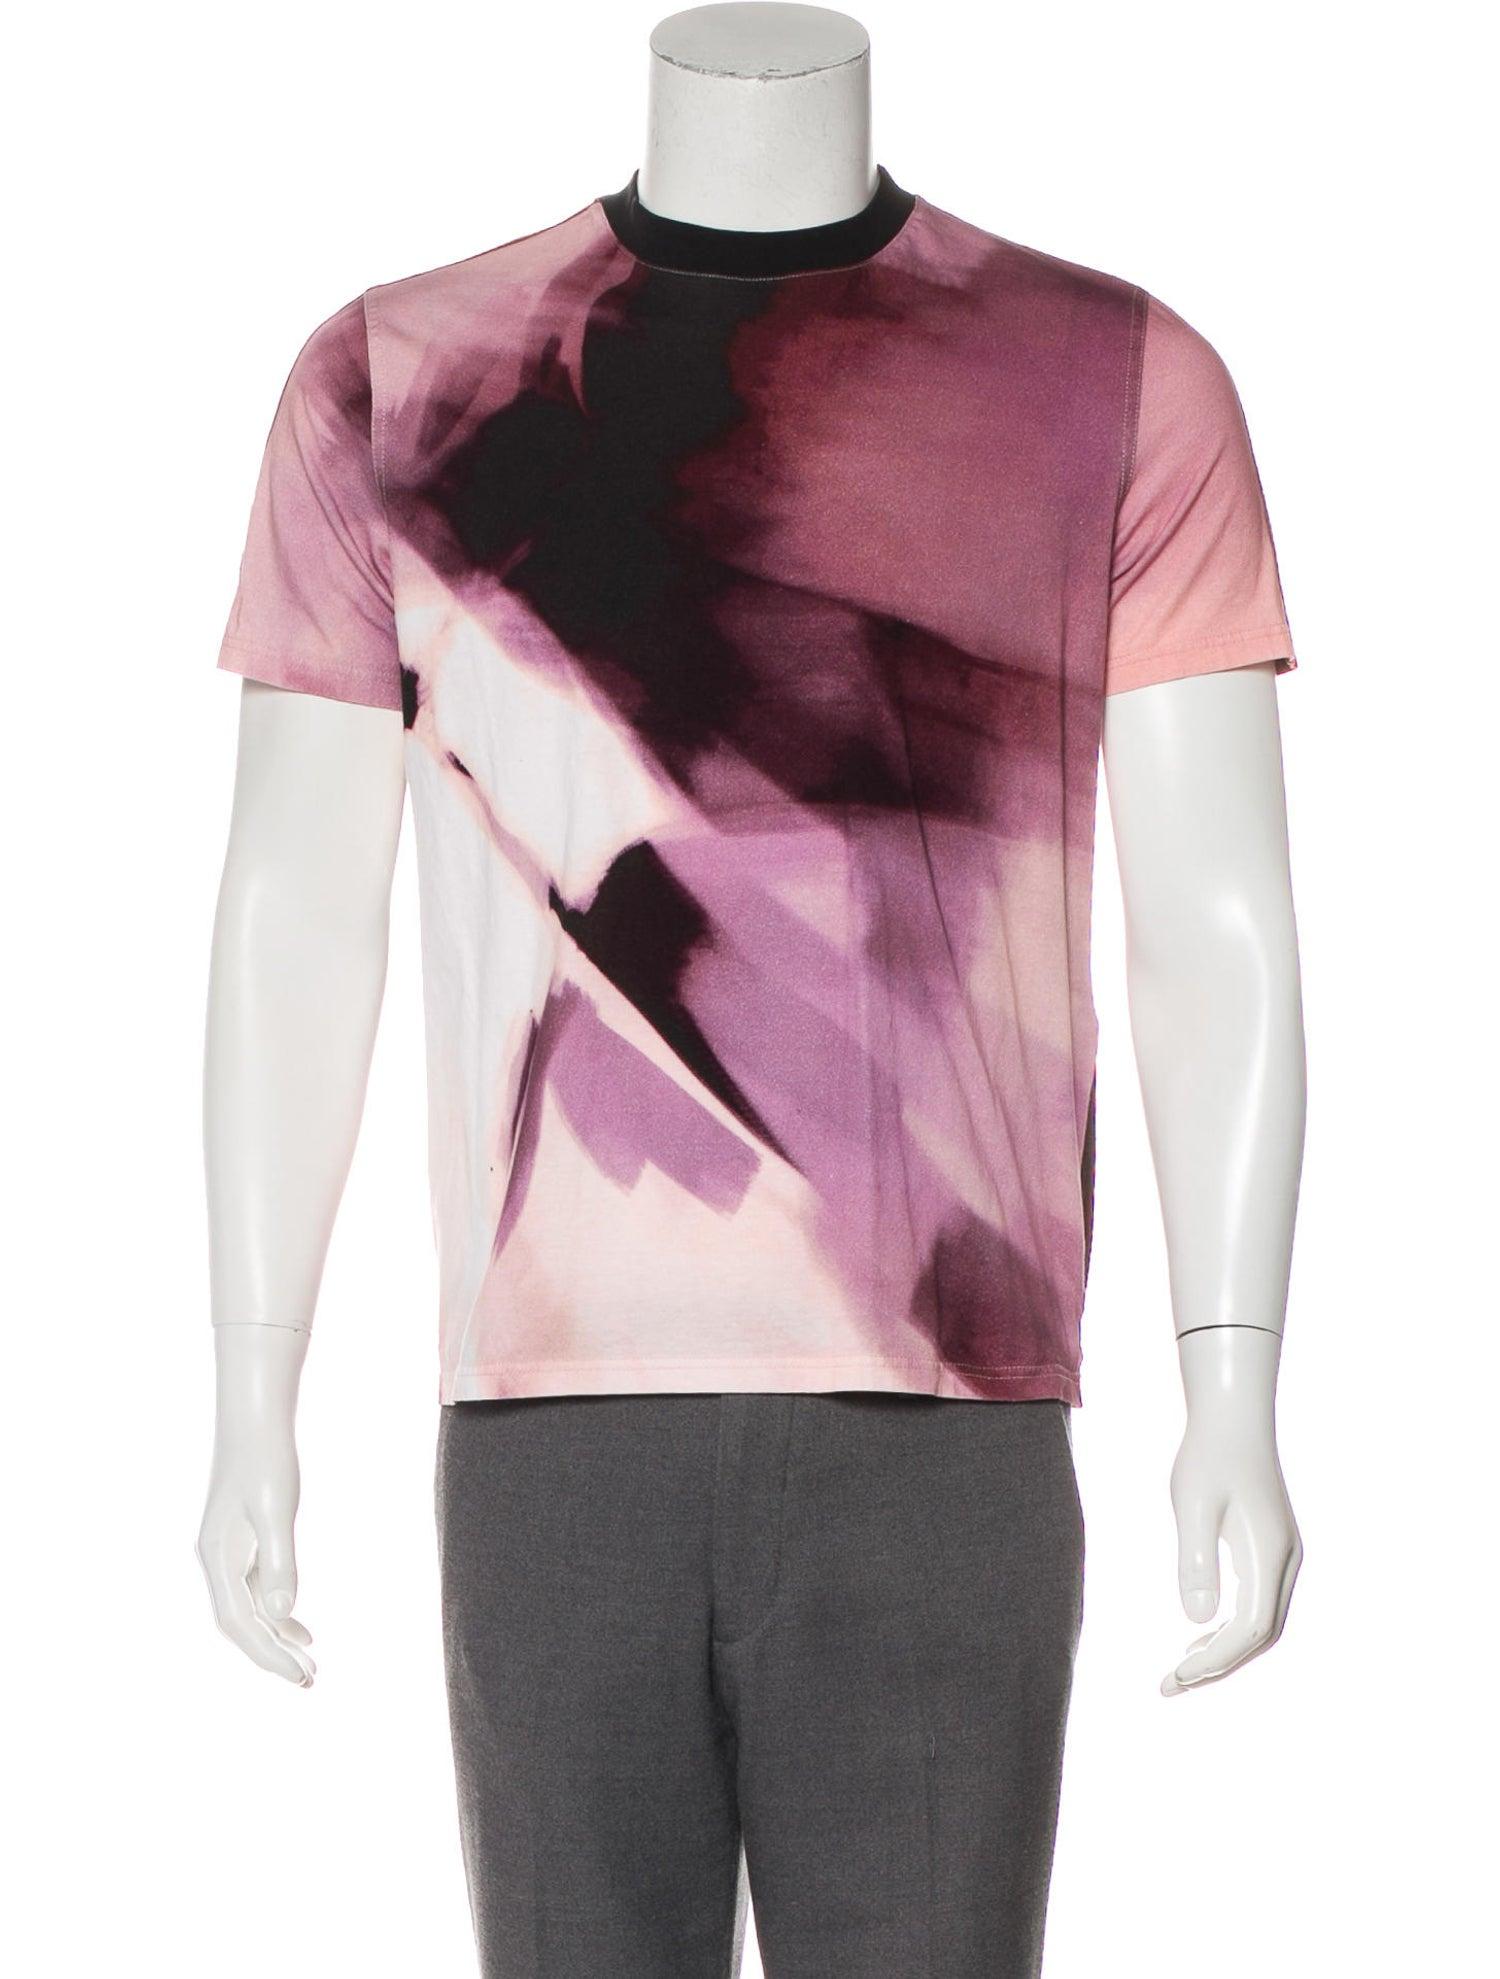 Brush Stroke Print TEE - Givenchy, $137.50